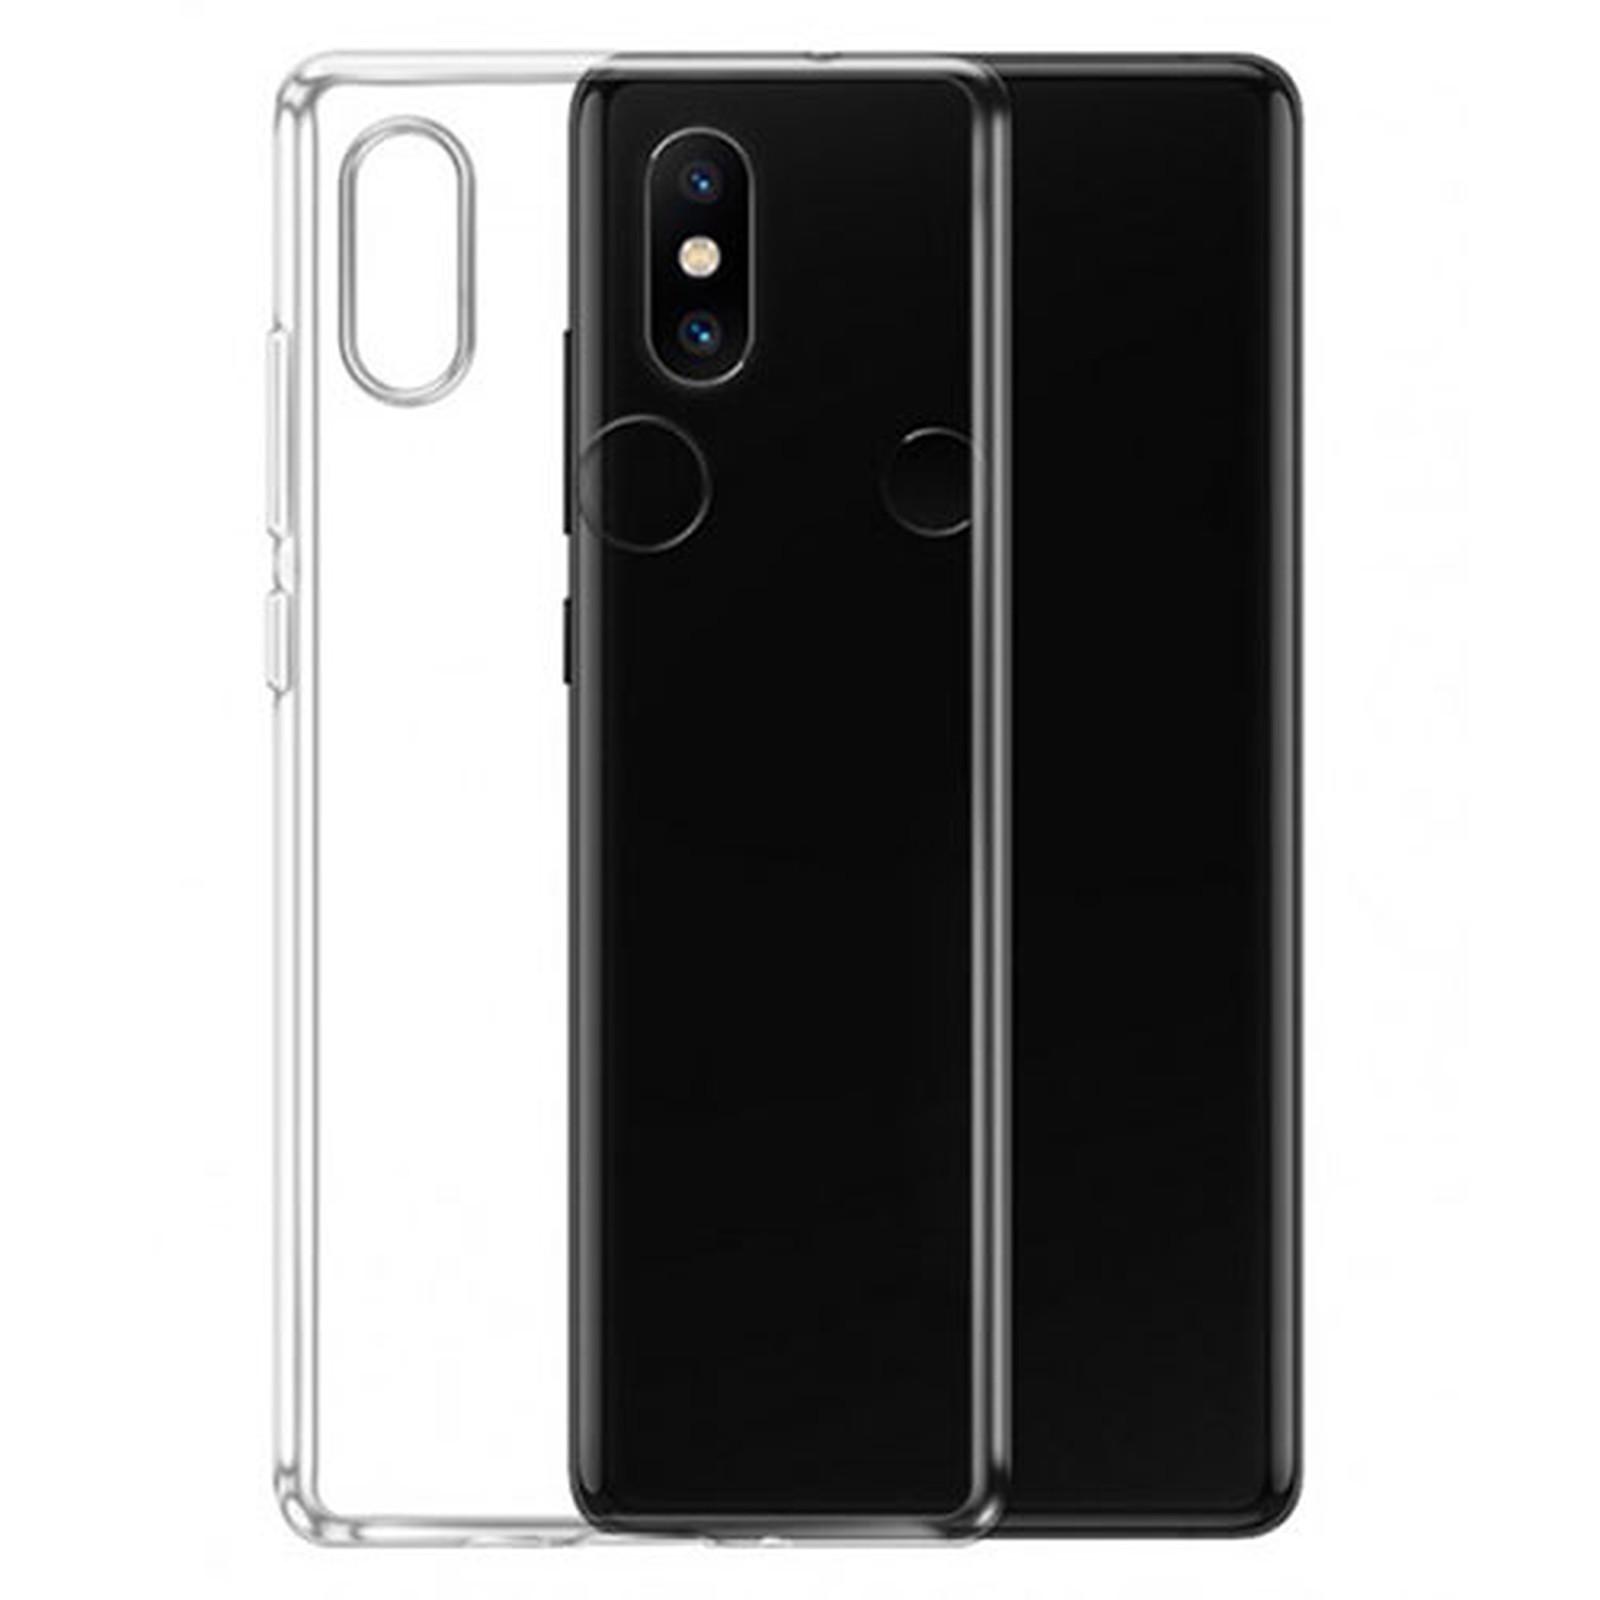 Akashi Coque TPU Transparente Xiaomi Mi Mix 2S